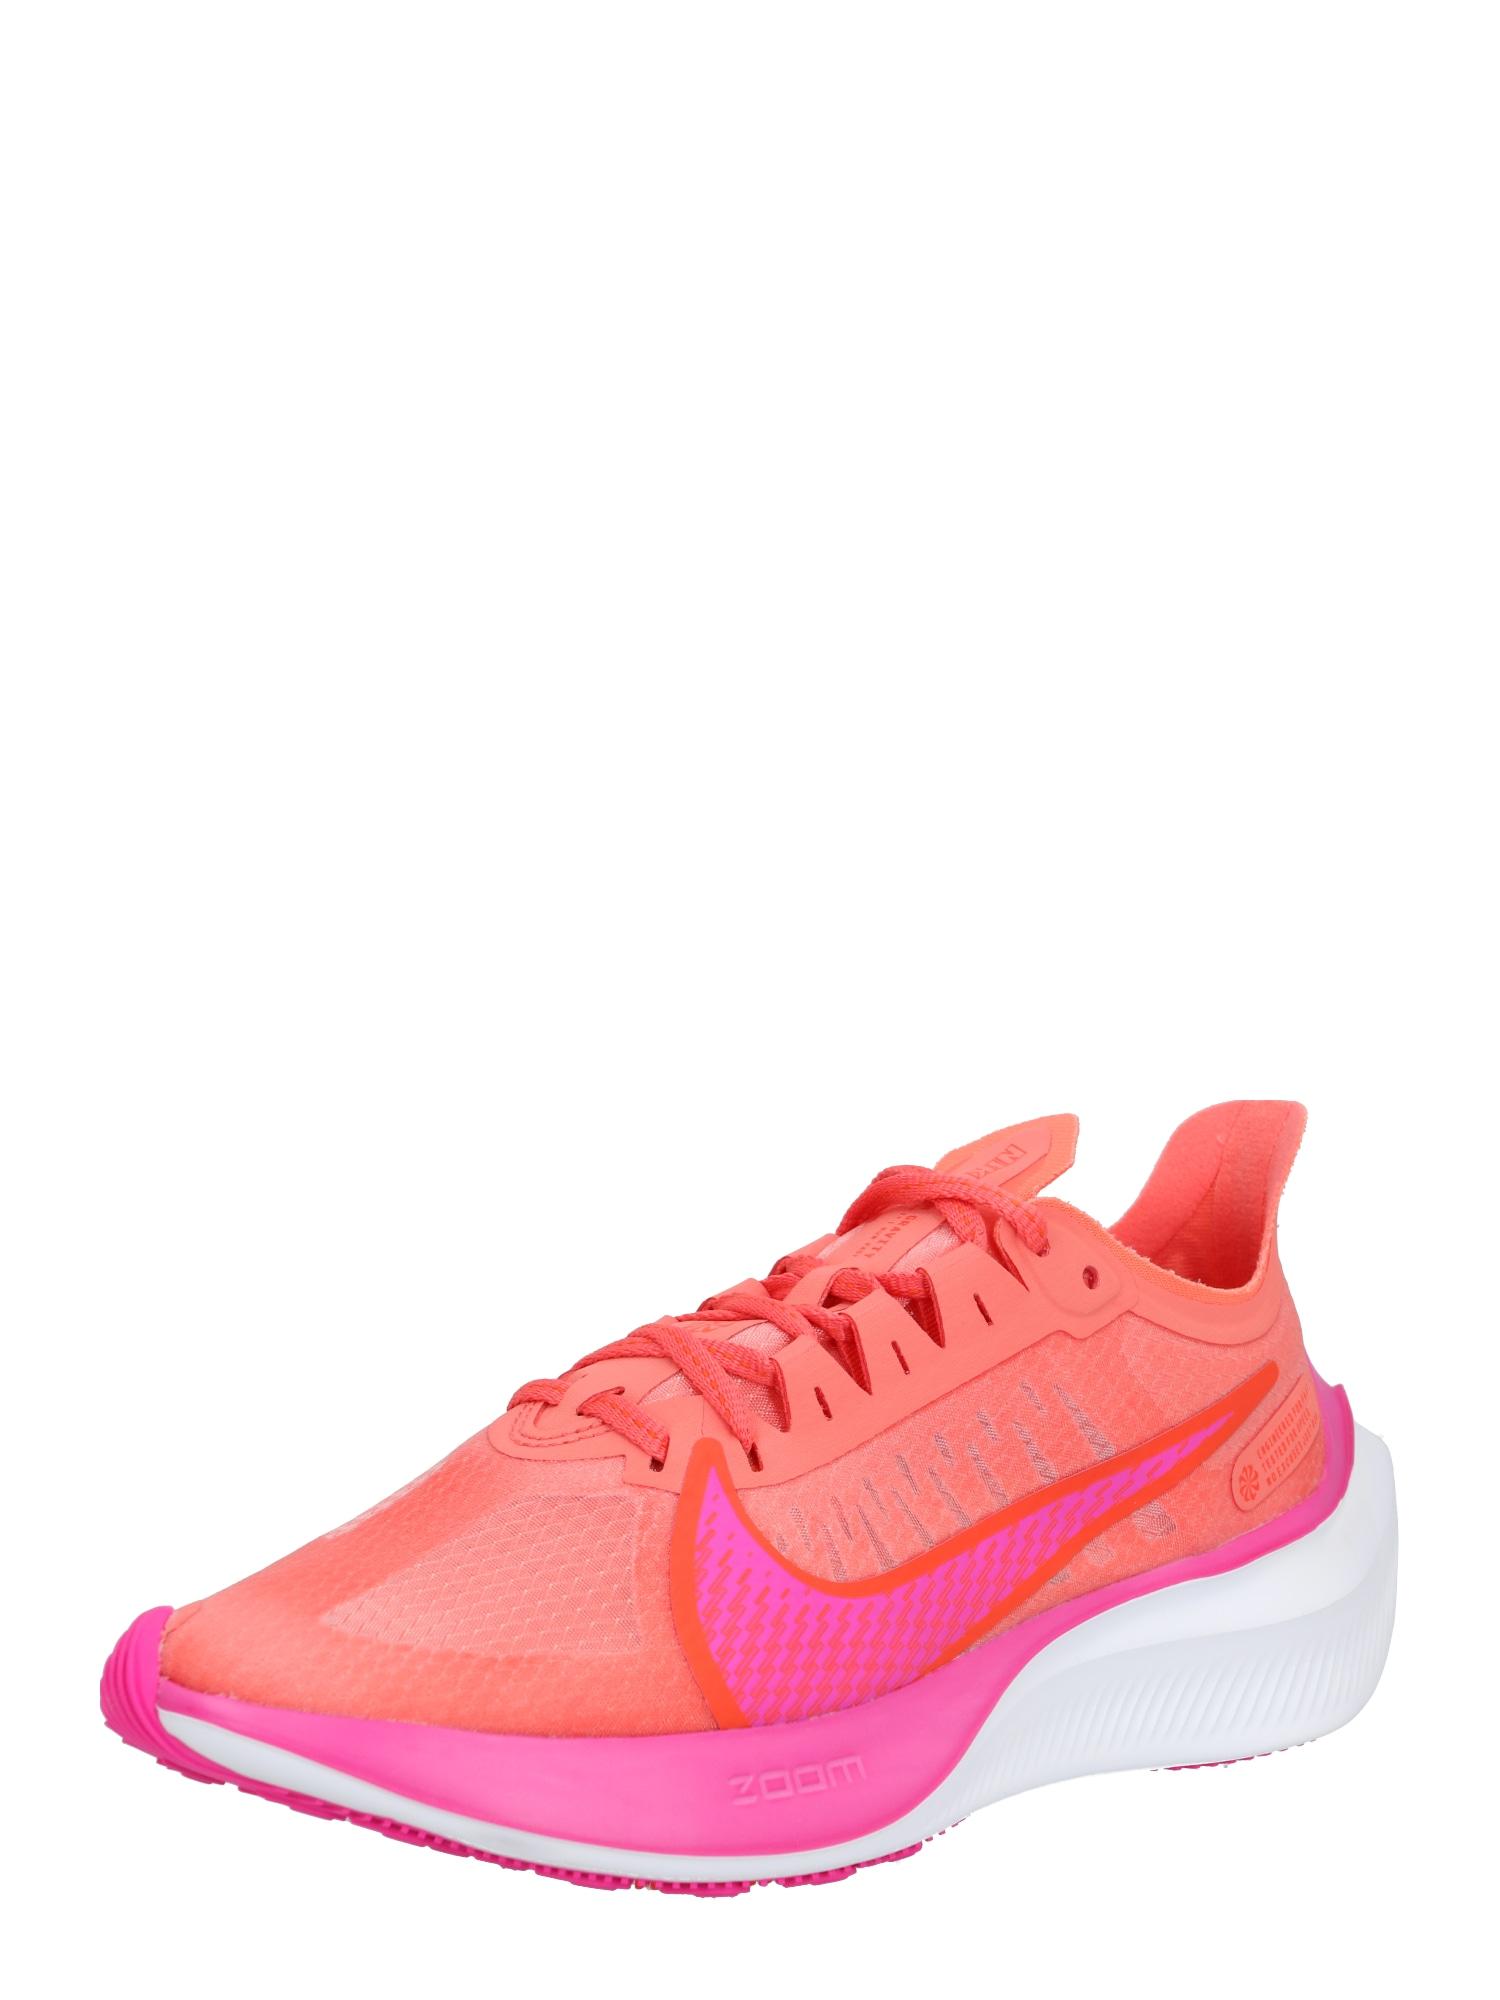 NIKE Bežecká obuv 'Nike Zoom Gravity'  ružová / oranžová